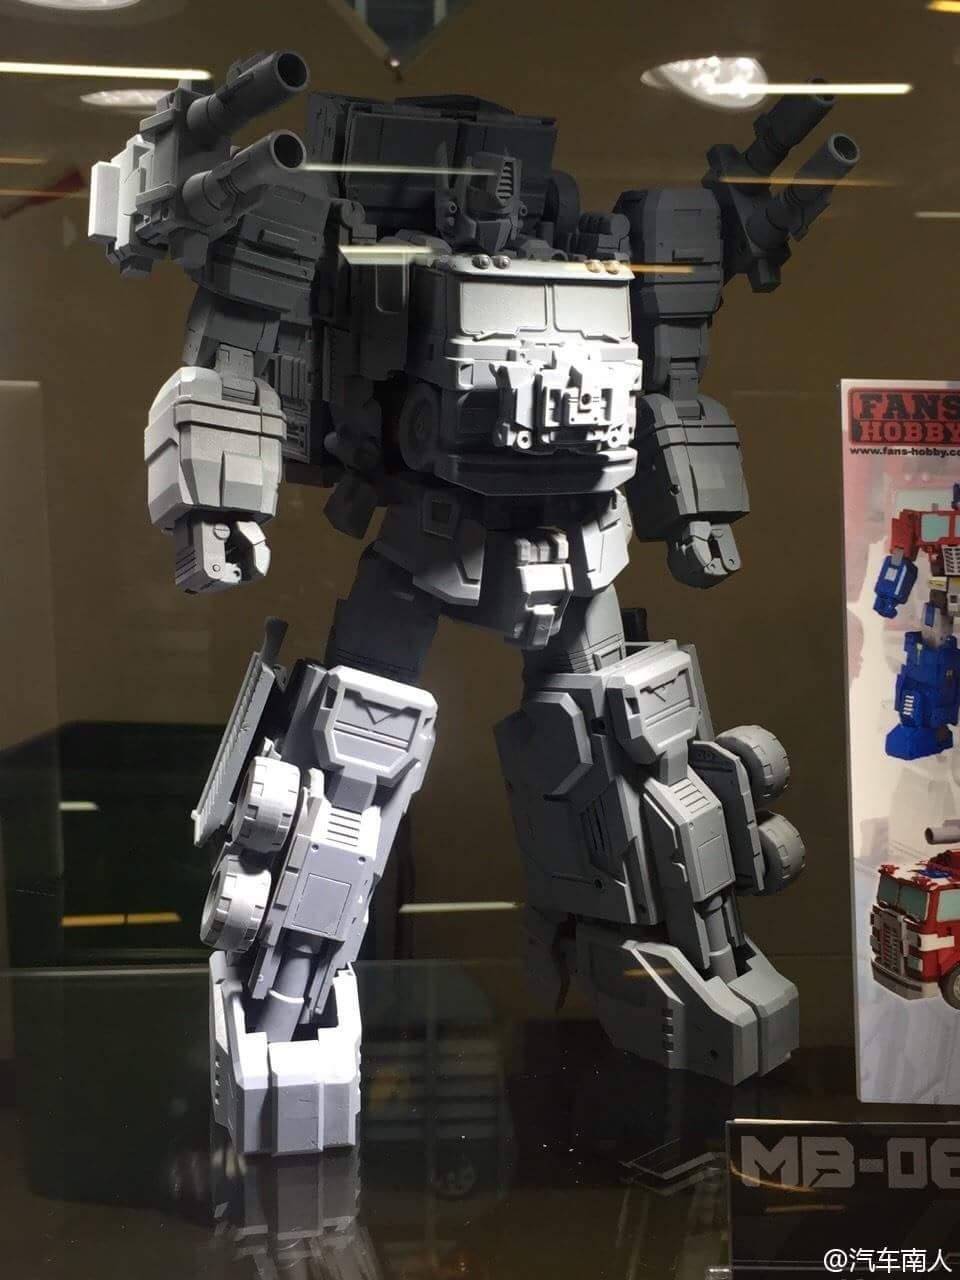 [FansHobby] Produit Tiers - MB-06 Power Baser (aka Powermaster Optimus) + MB-11 God Armour (aka Godbomber) - TF Masterforce OfC1JzDV